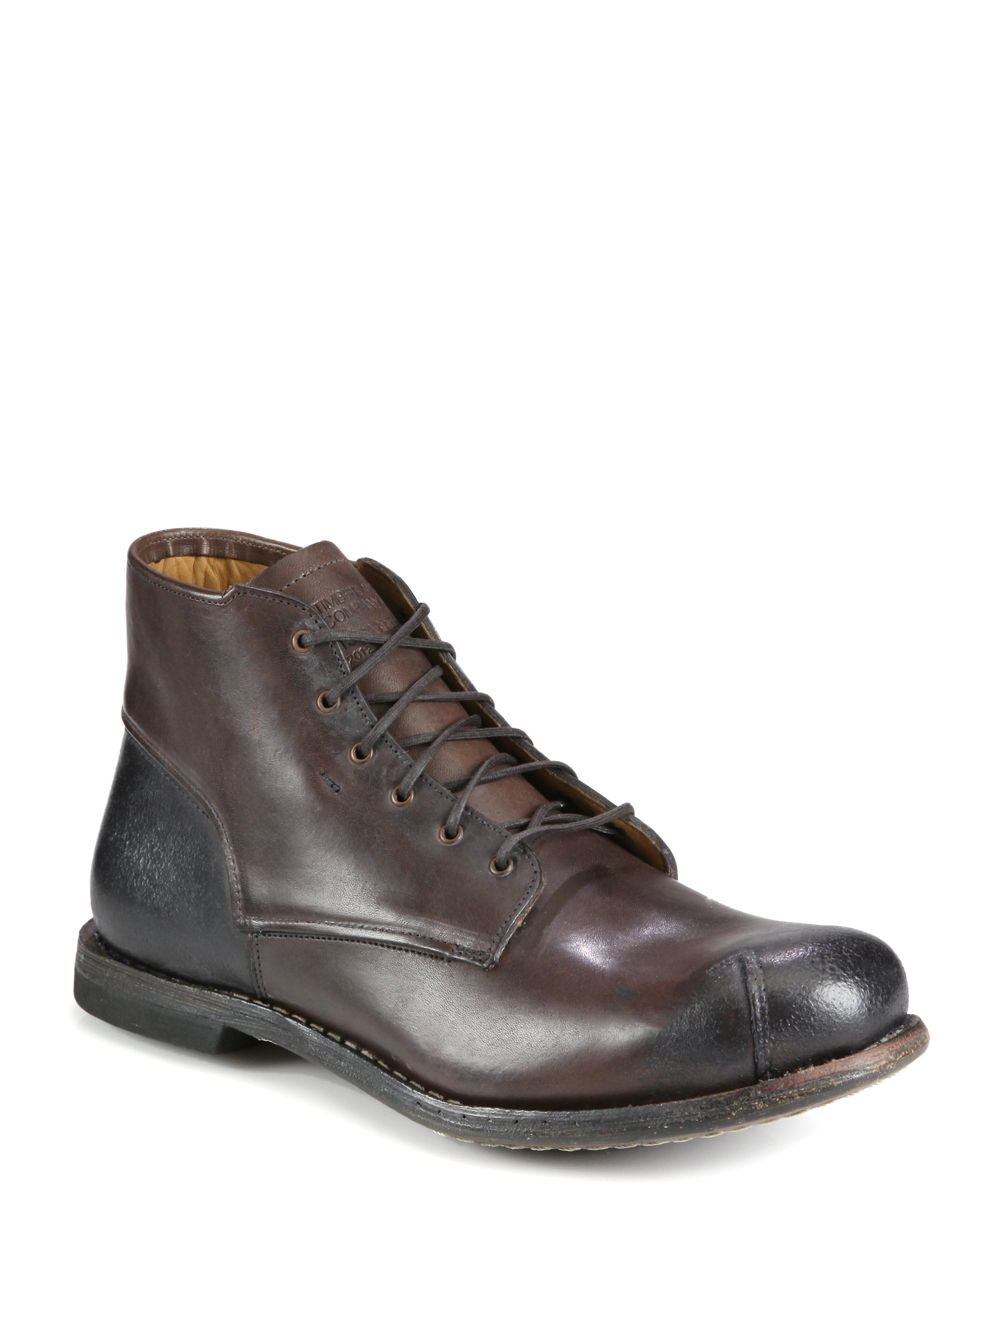 timberland boot company carries chukka